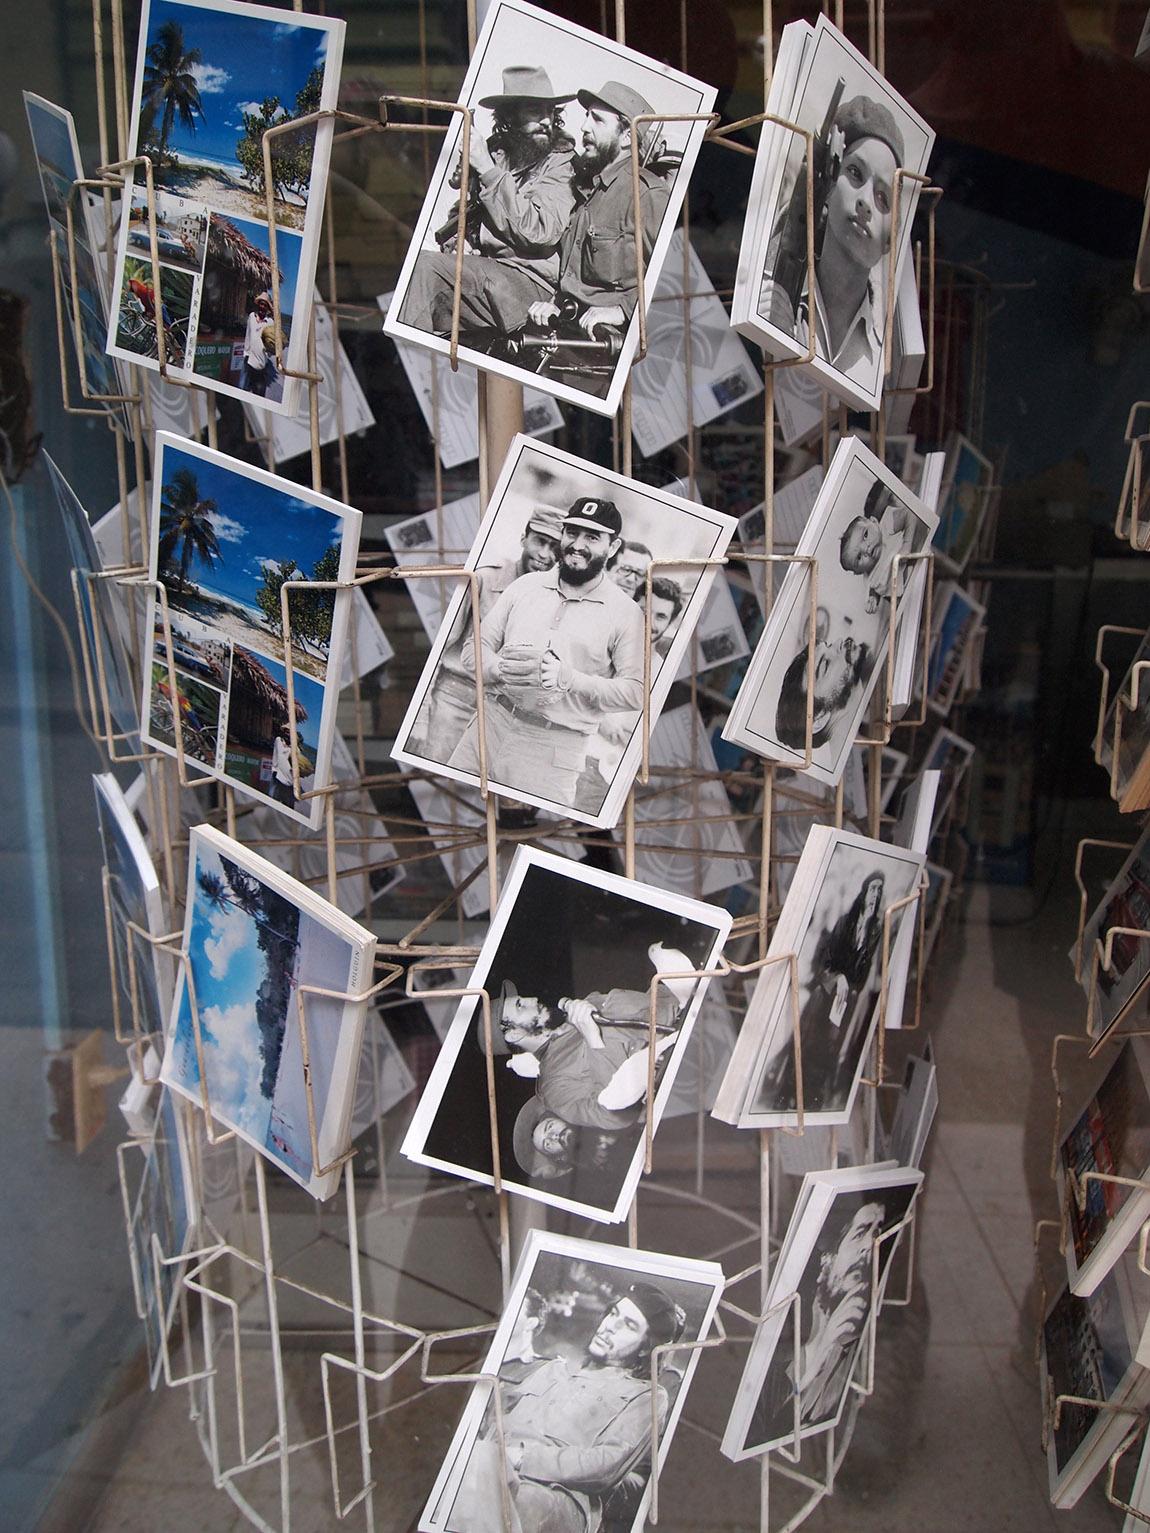 Cuba-Havana-Postcards-Che-Fidel.jpg